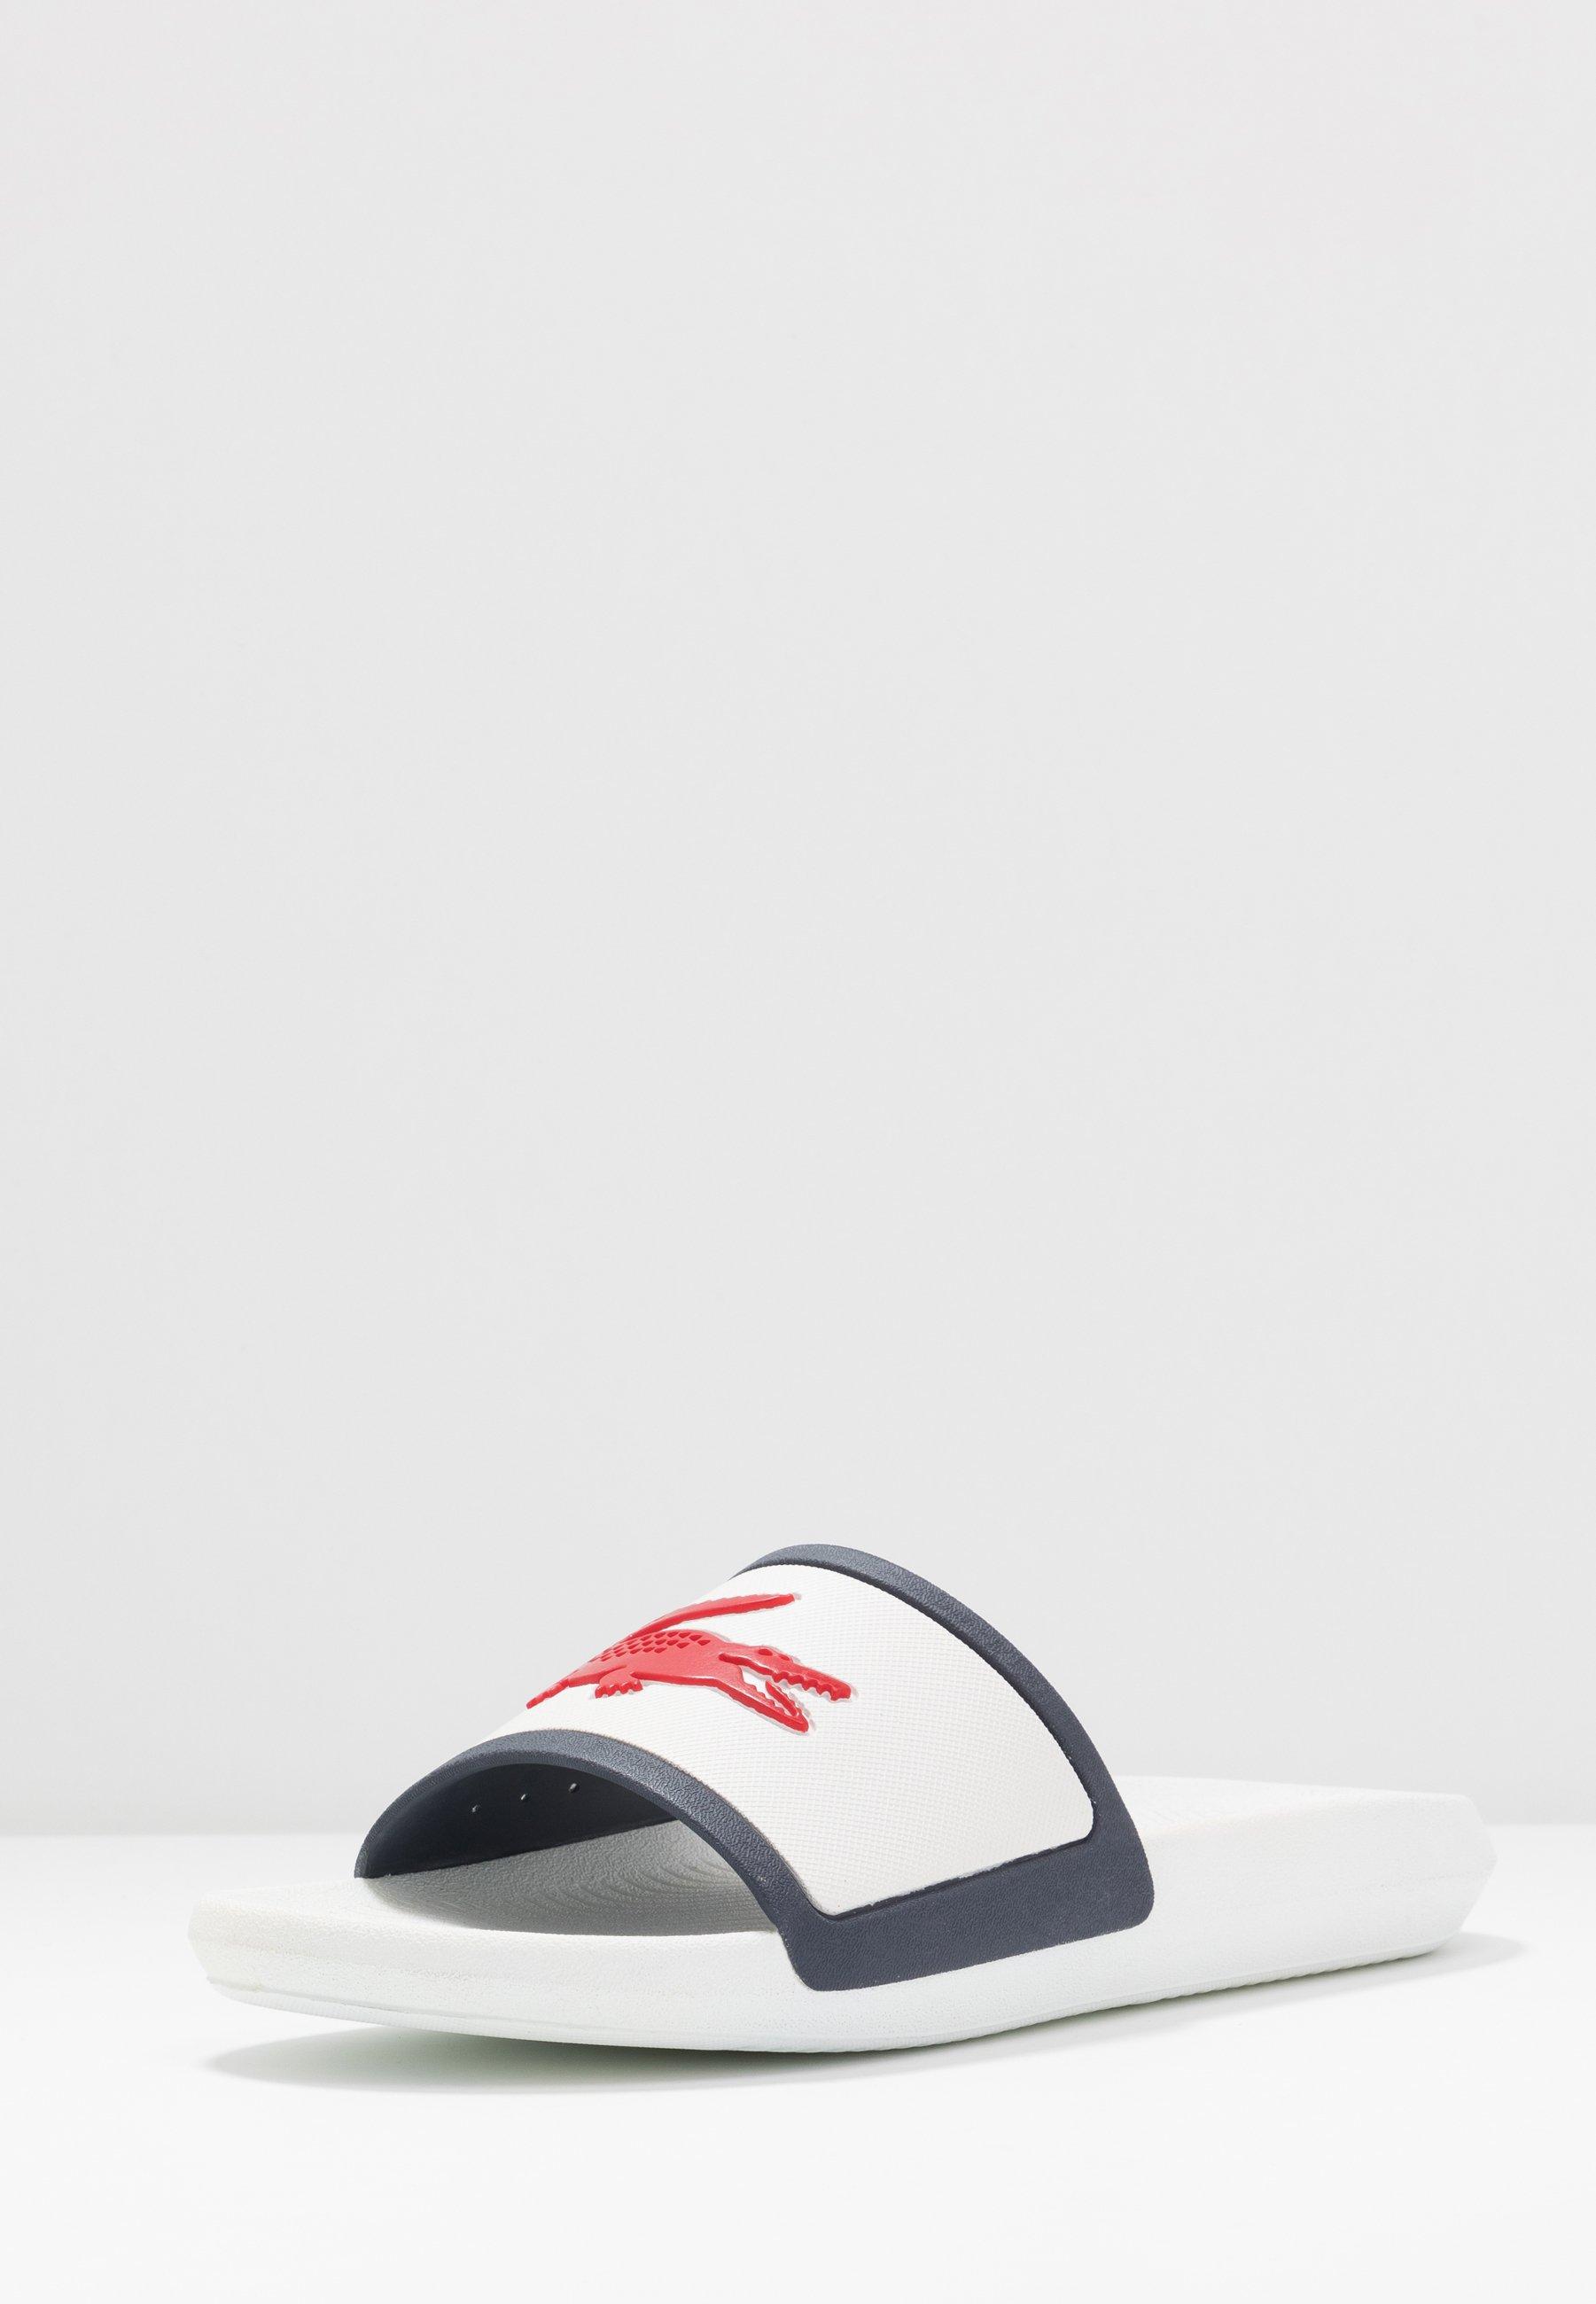 Lacoste CROCO SLIDE - Badesandaler - white/navy/red